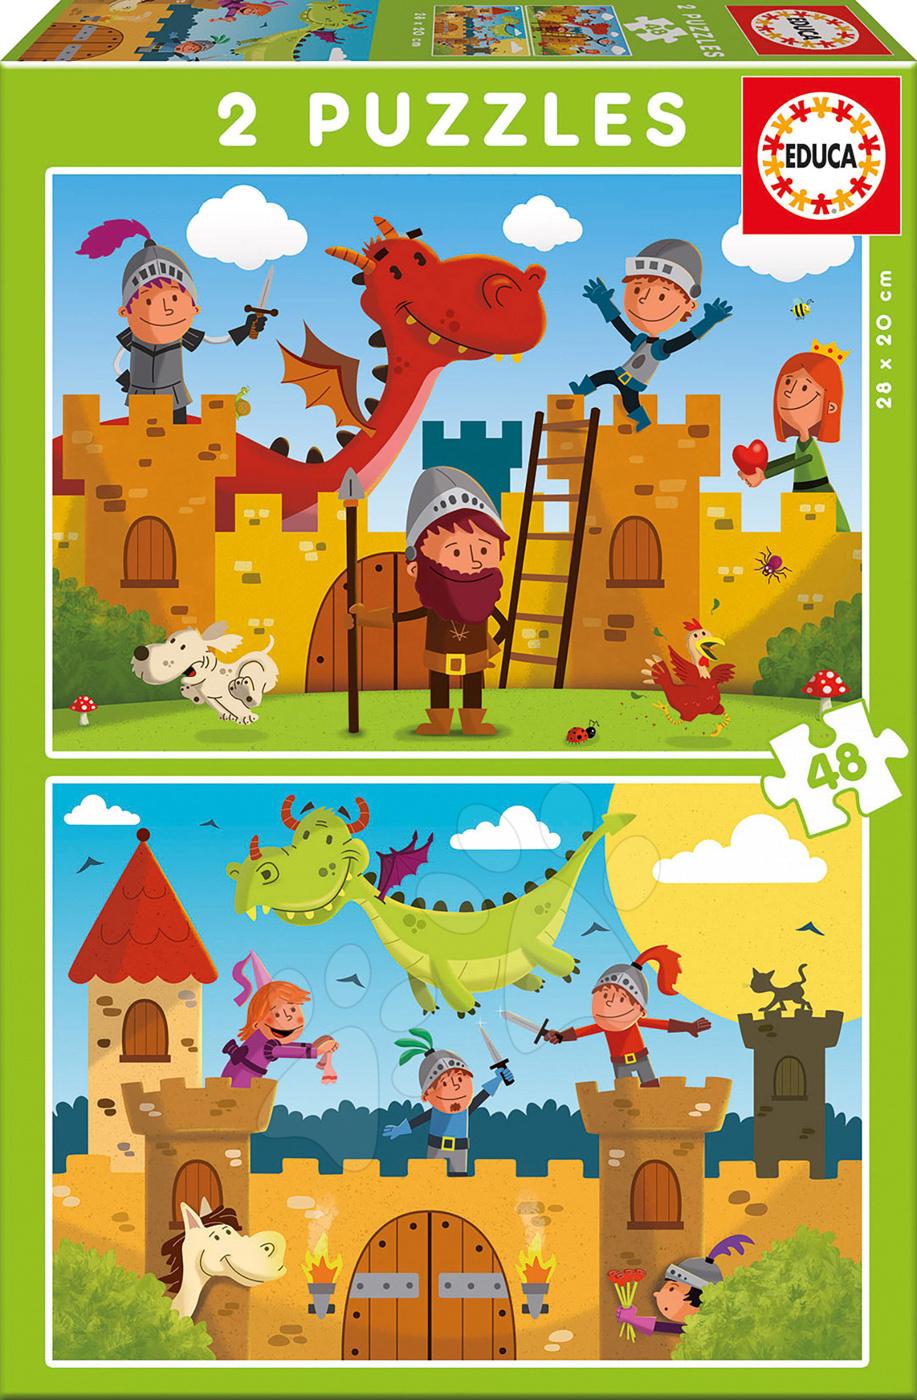 Pohádkové puzzle Drak a Rytíř Educa 2x48 dílů